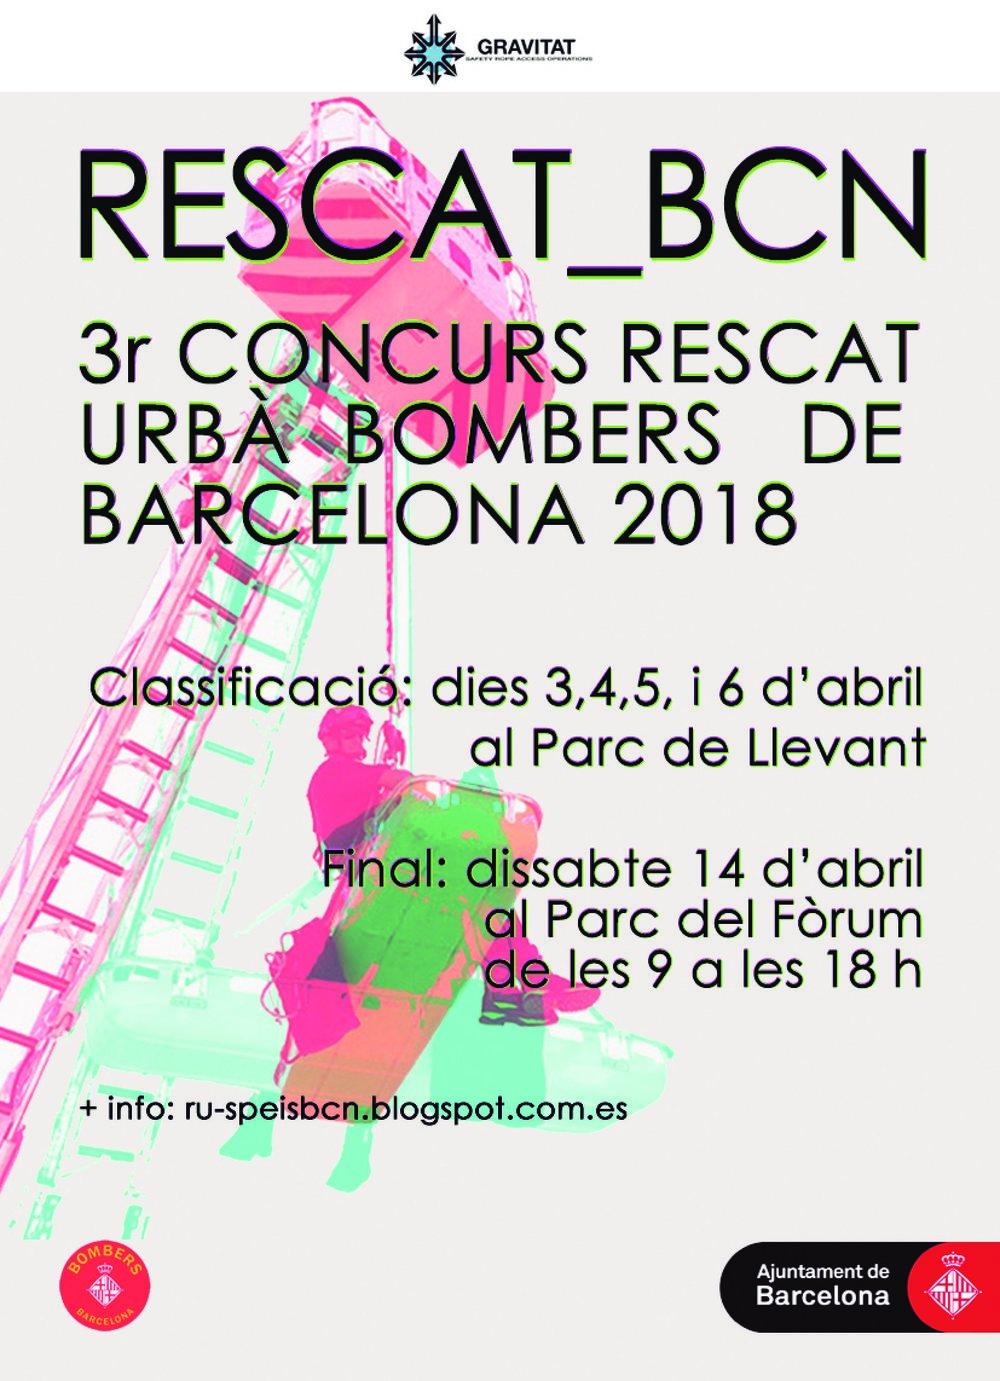 3r Concurso Interno de Rescate Urbano, Bomberos de Barcelona 2018